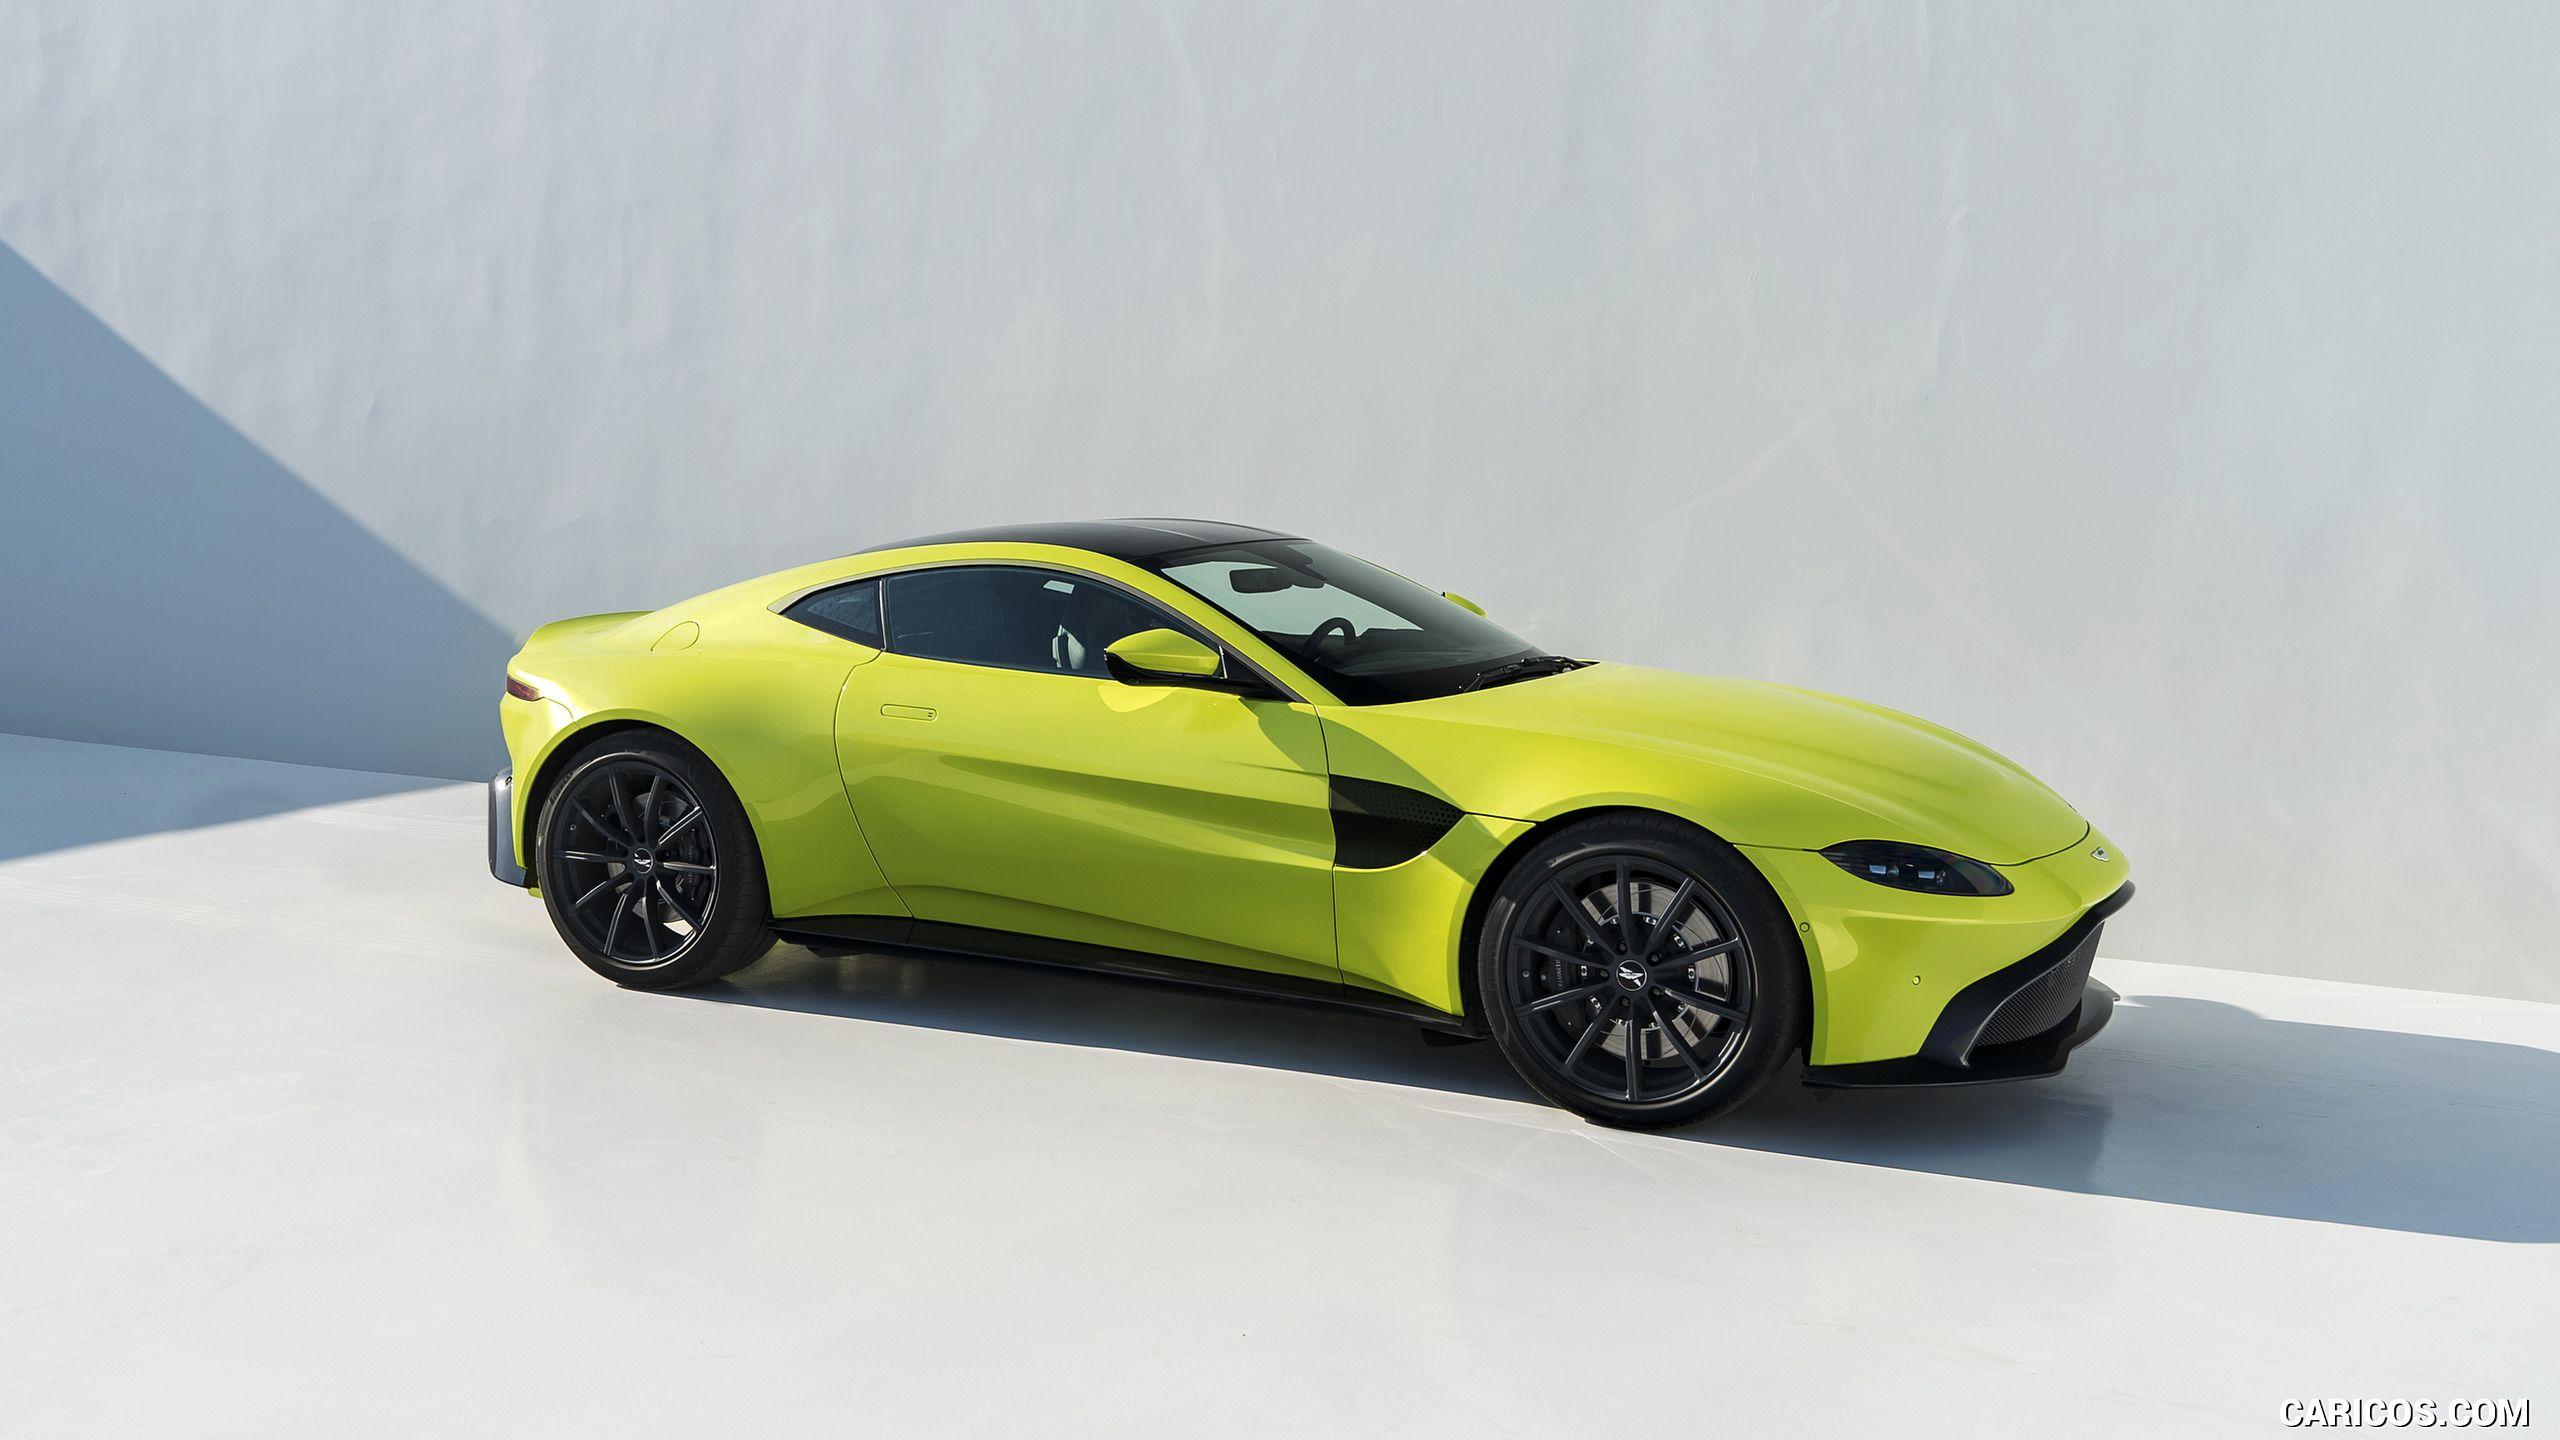 2019 Aston Martin Vantage Wallpaper Aston Martin Cars Aston 2560x1440